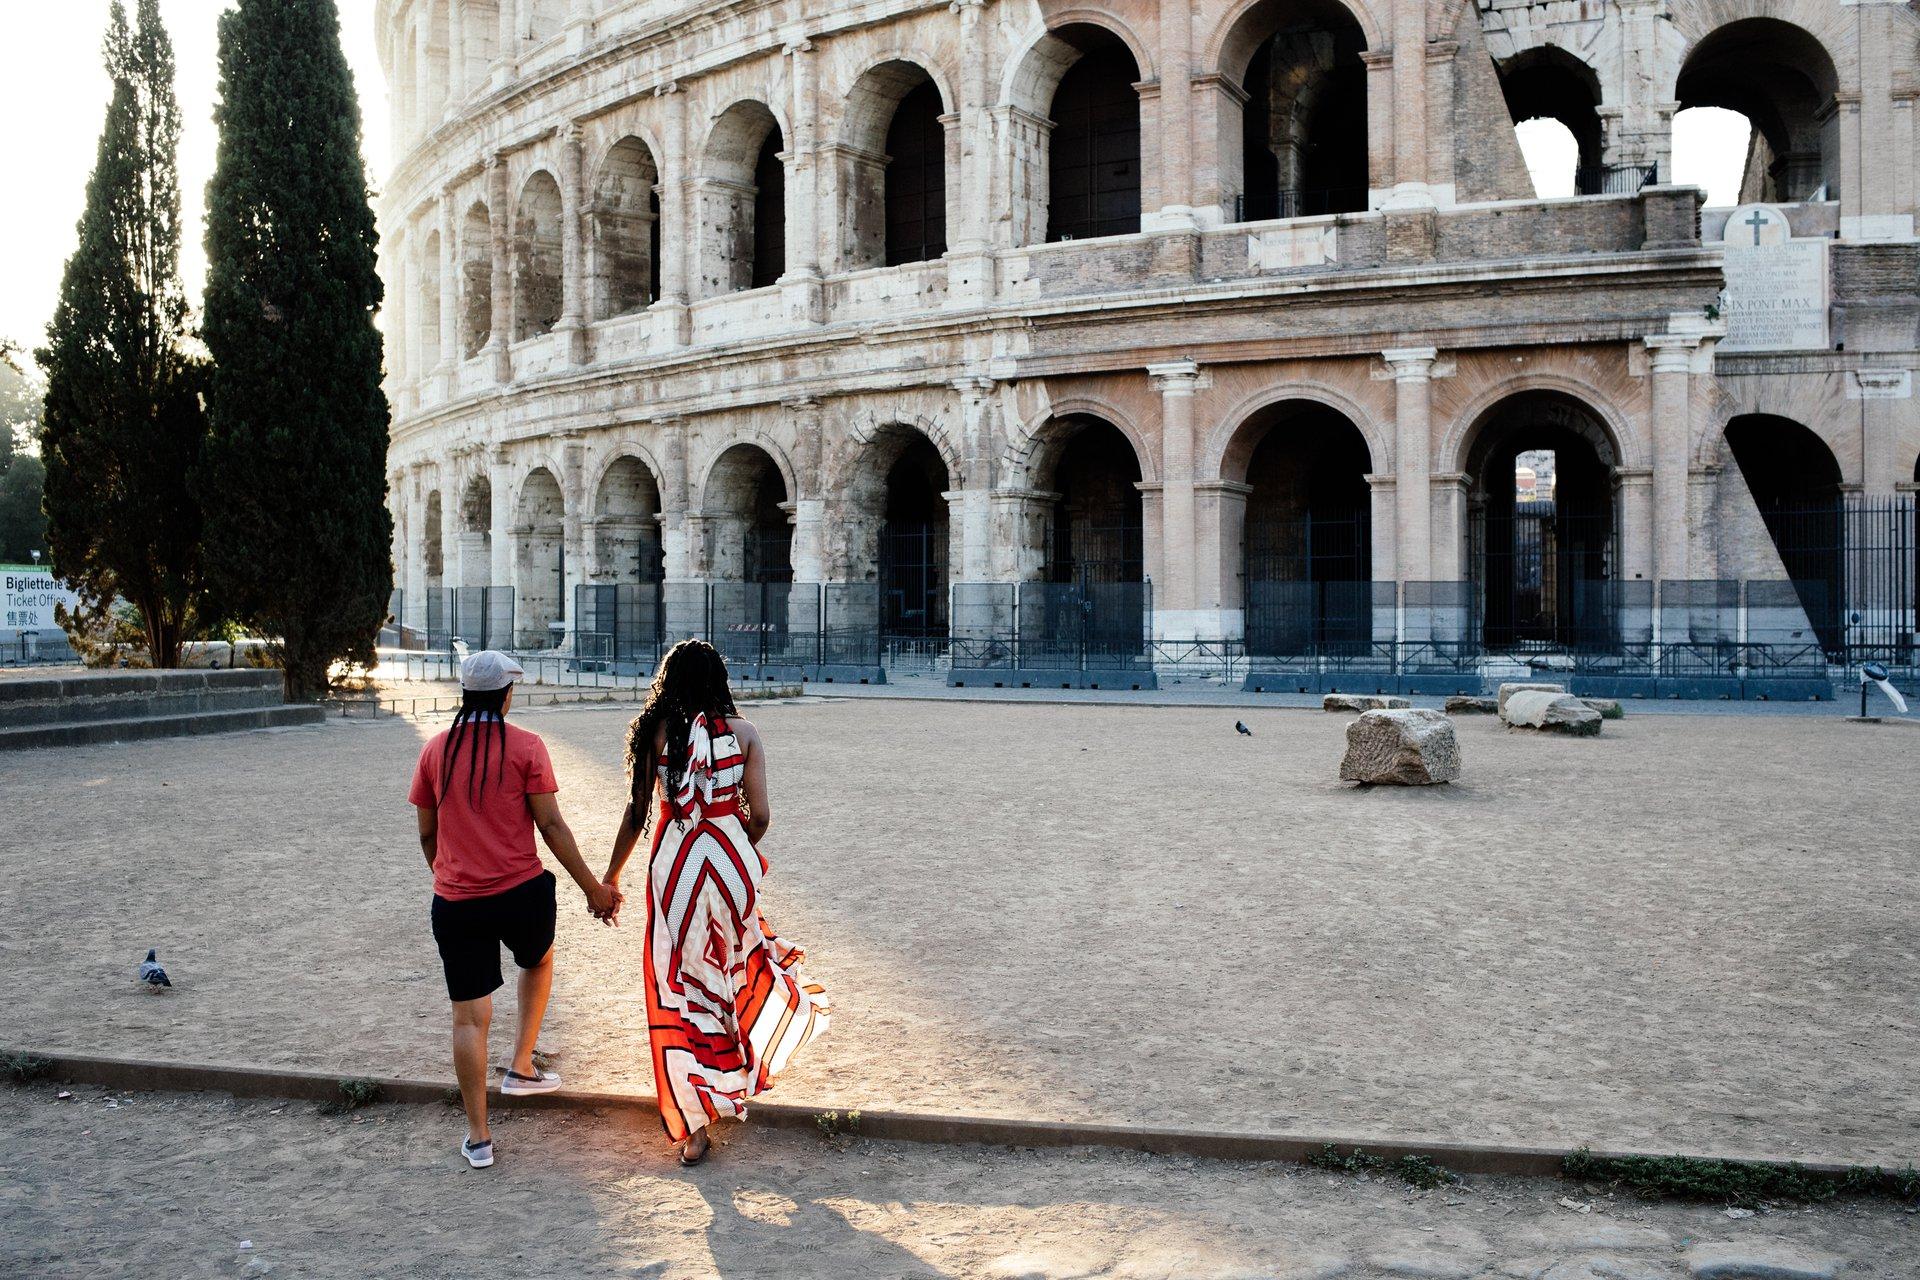 Rome-Italy-travel-story-Flytographer-45